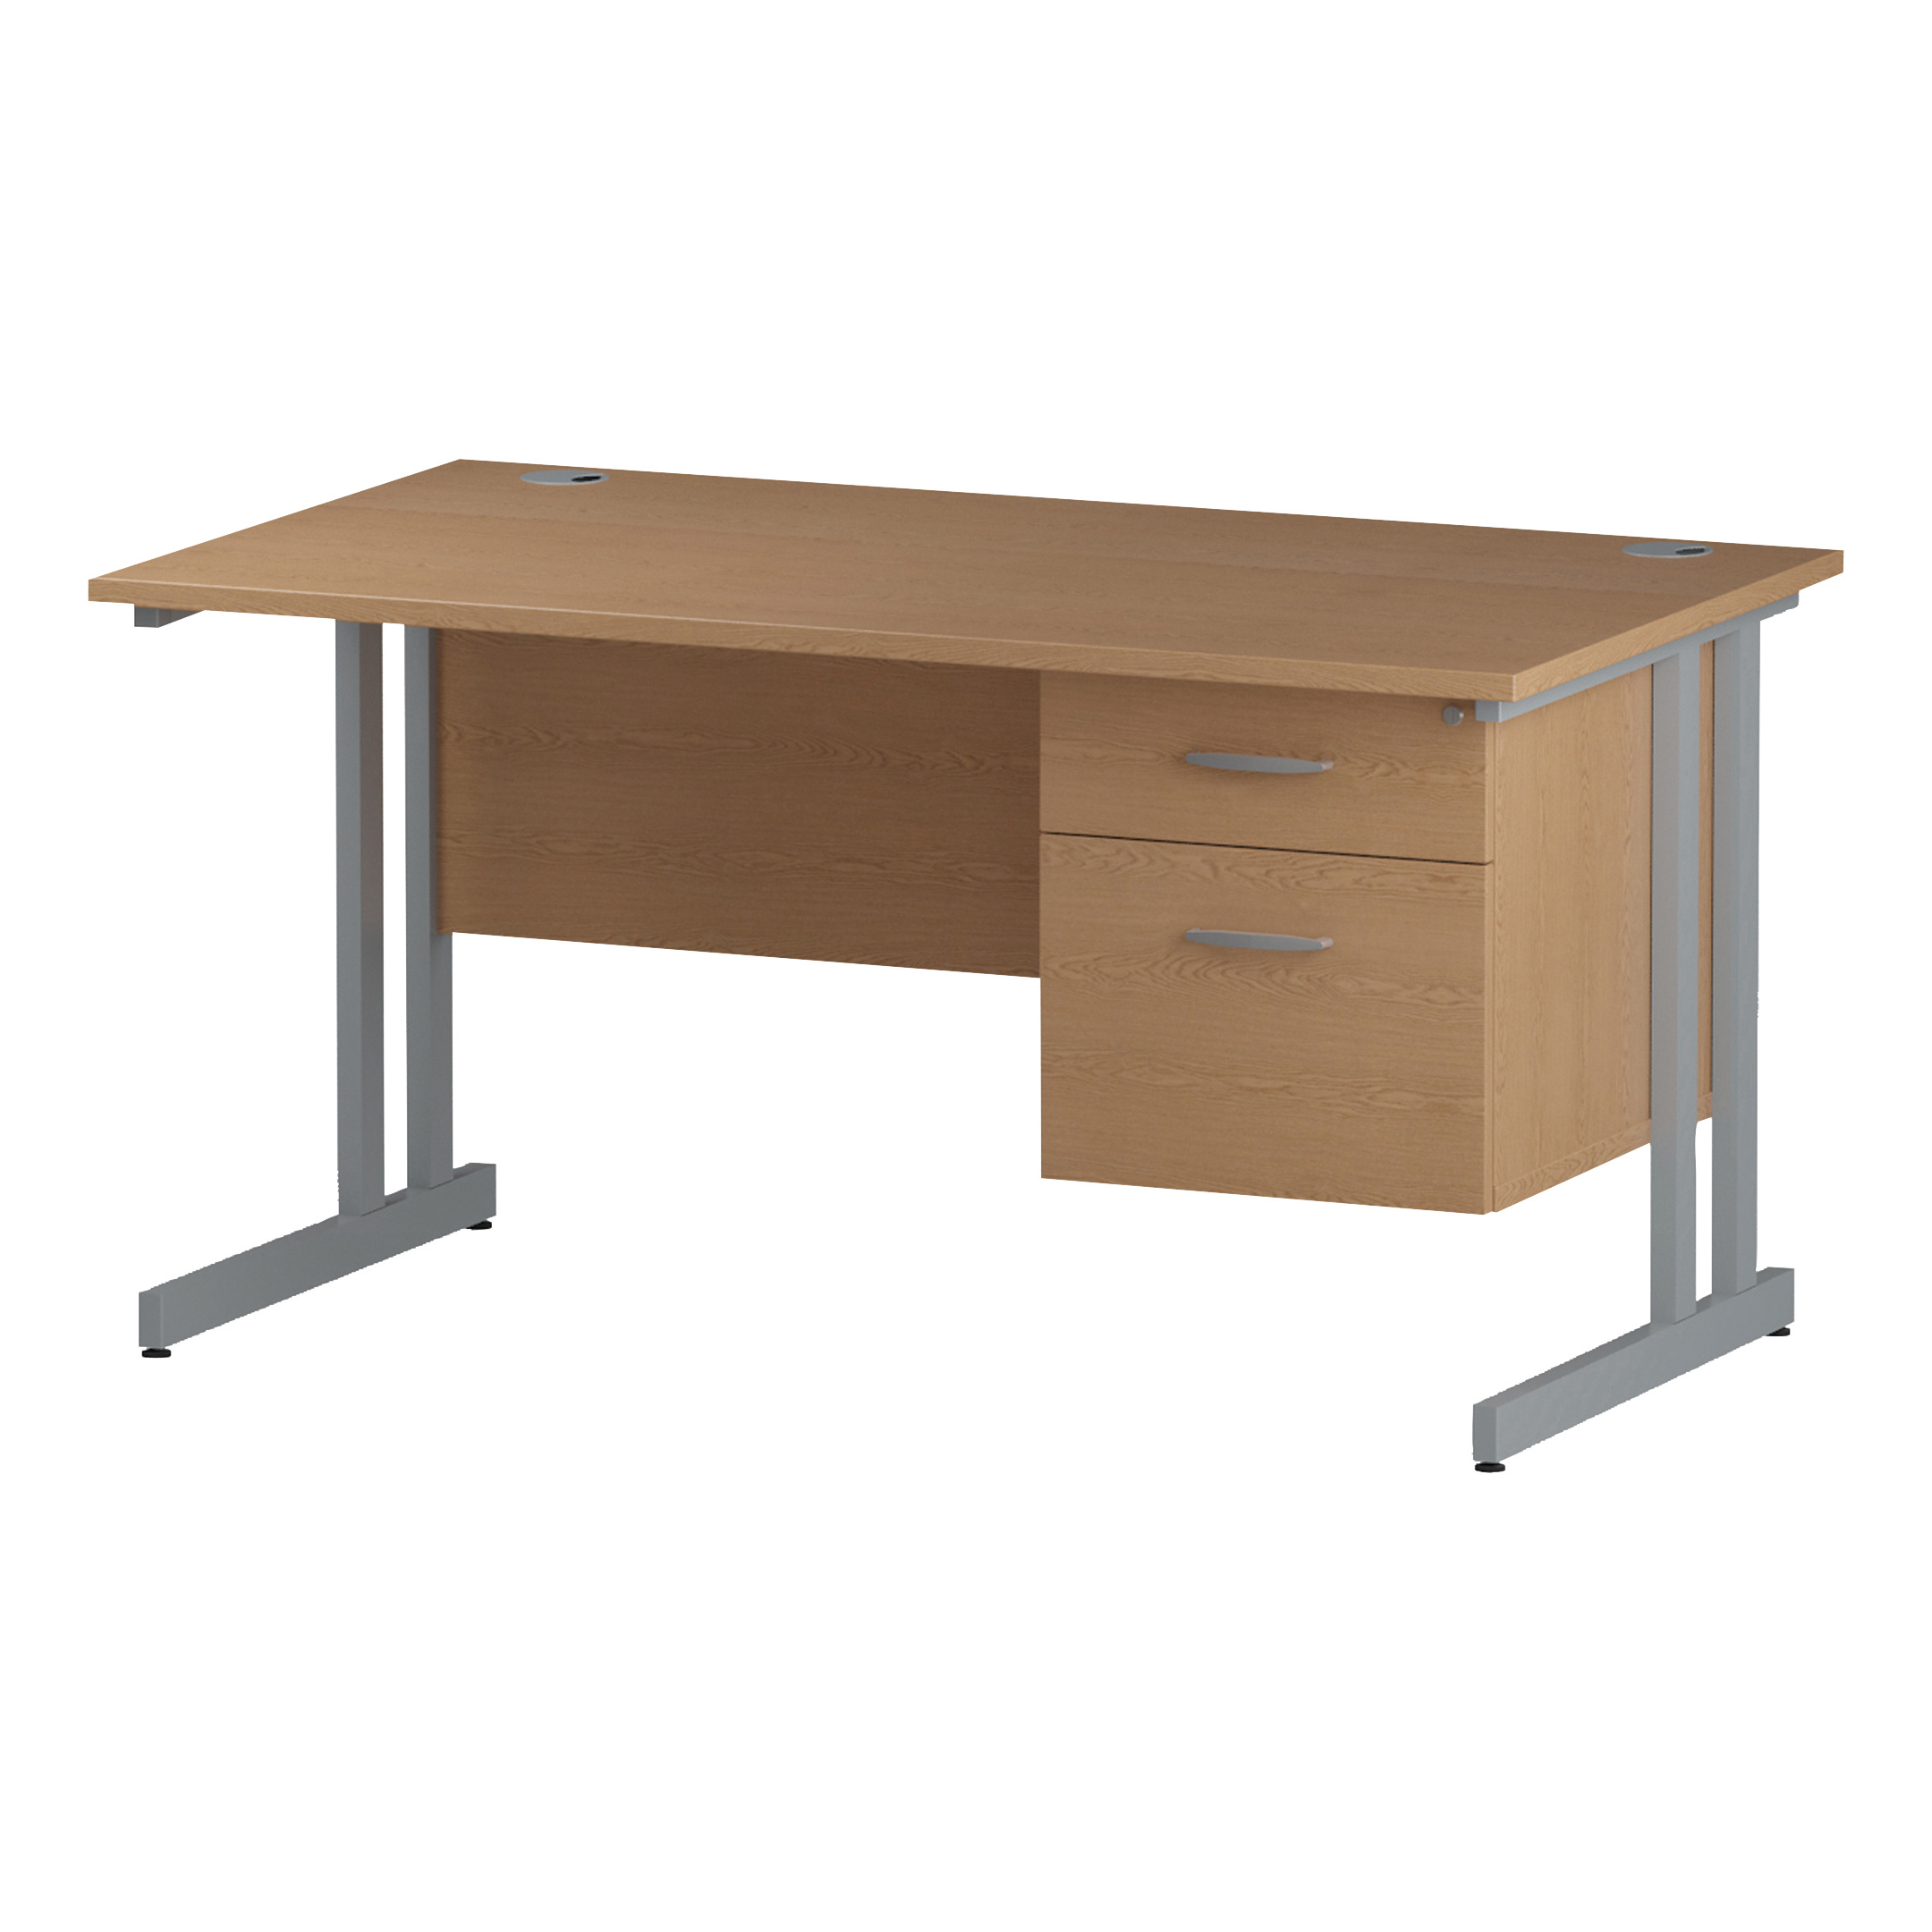 Trexus Rectangular Desk Silver Cantilever Leg 1400x800mm Fixed Pedestal 2 Drawers Oak Ref I002658